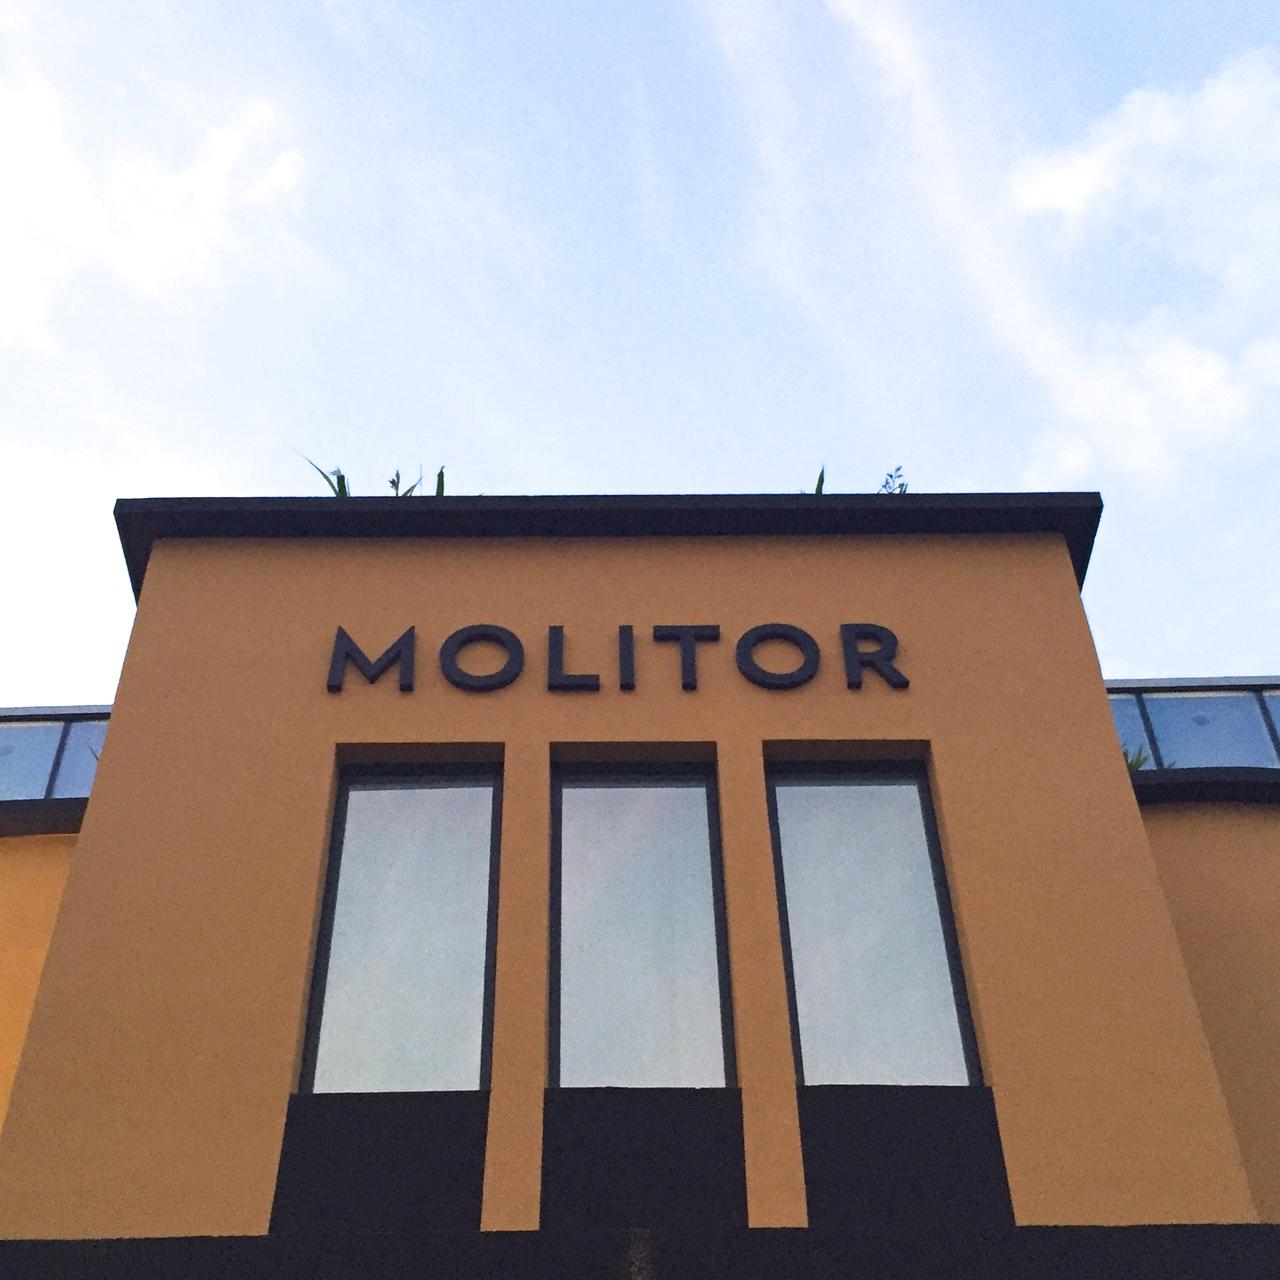 Piscine Molitor x By Paulette